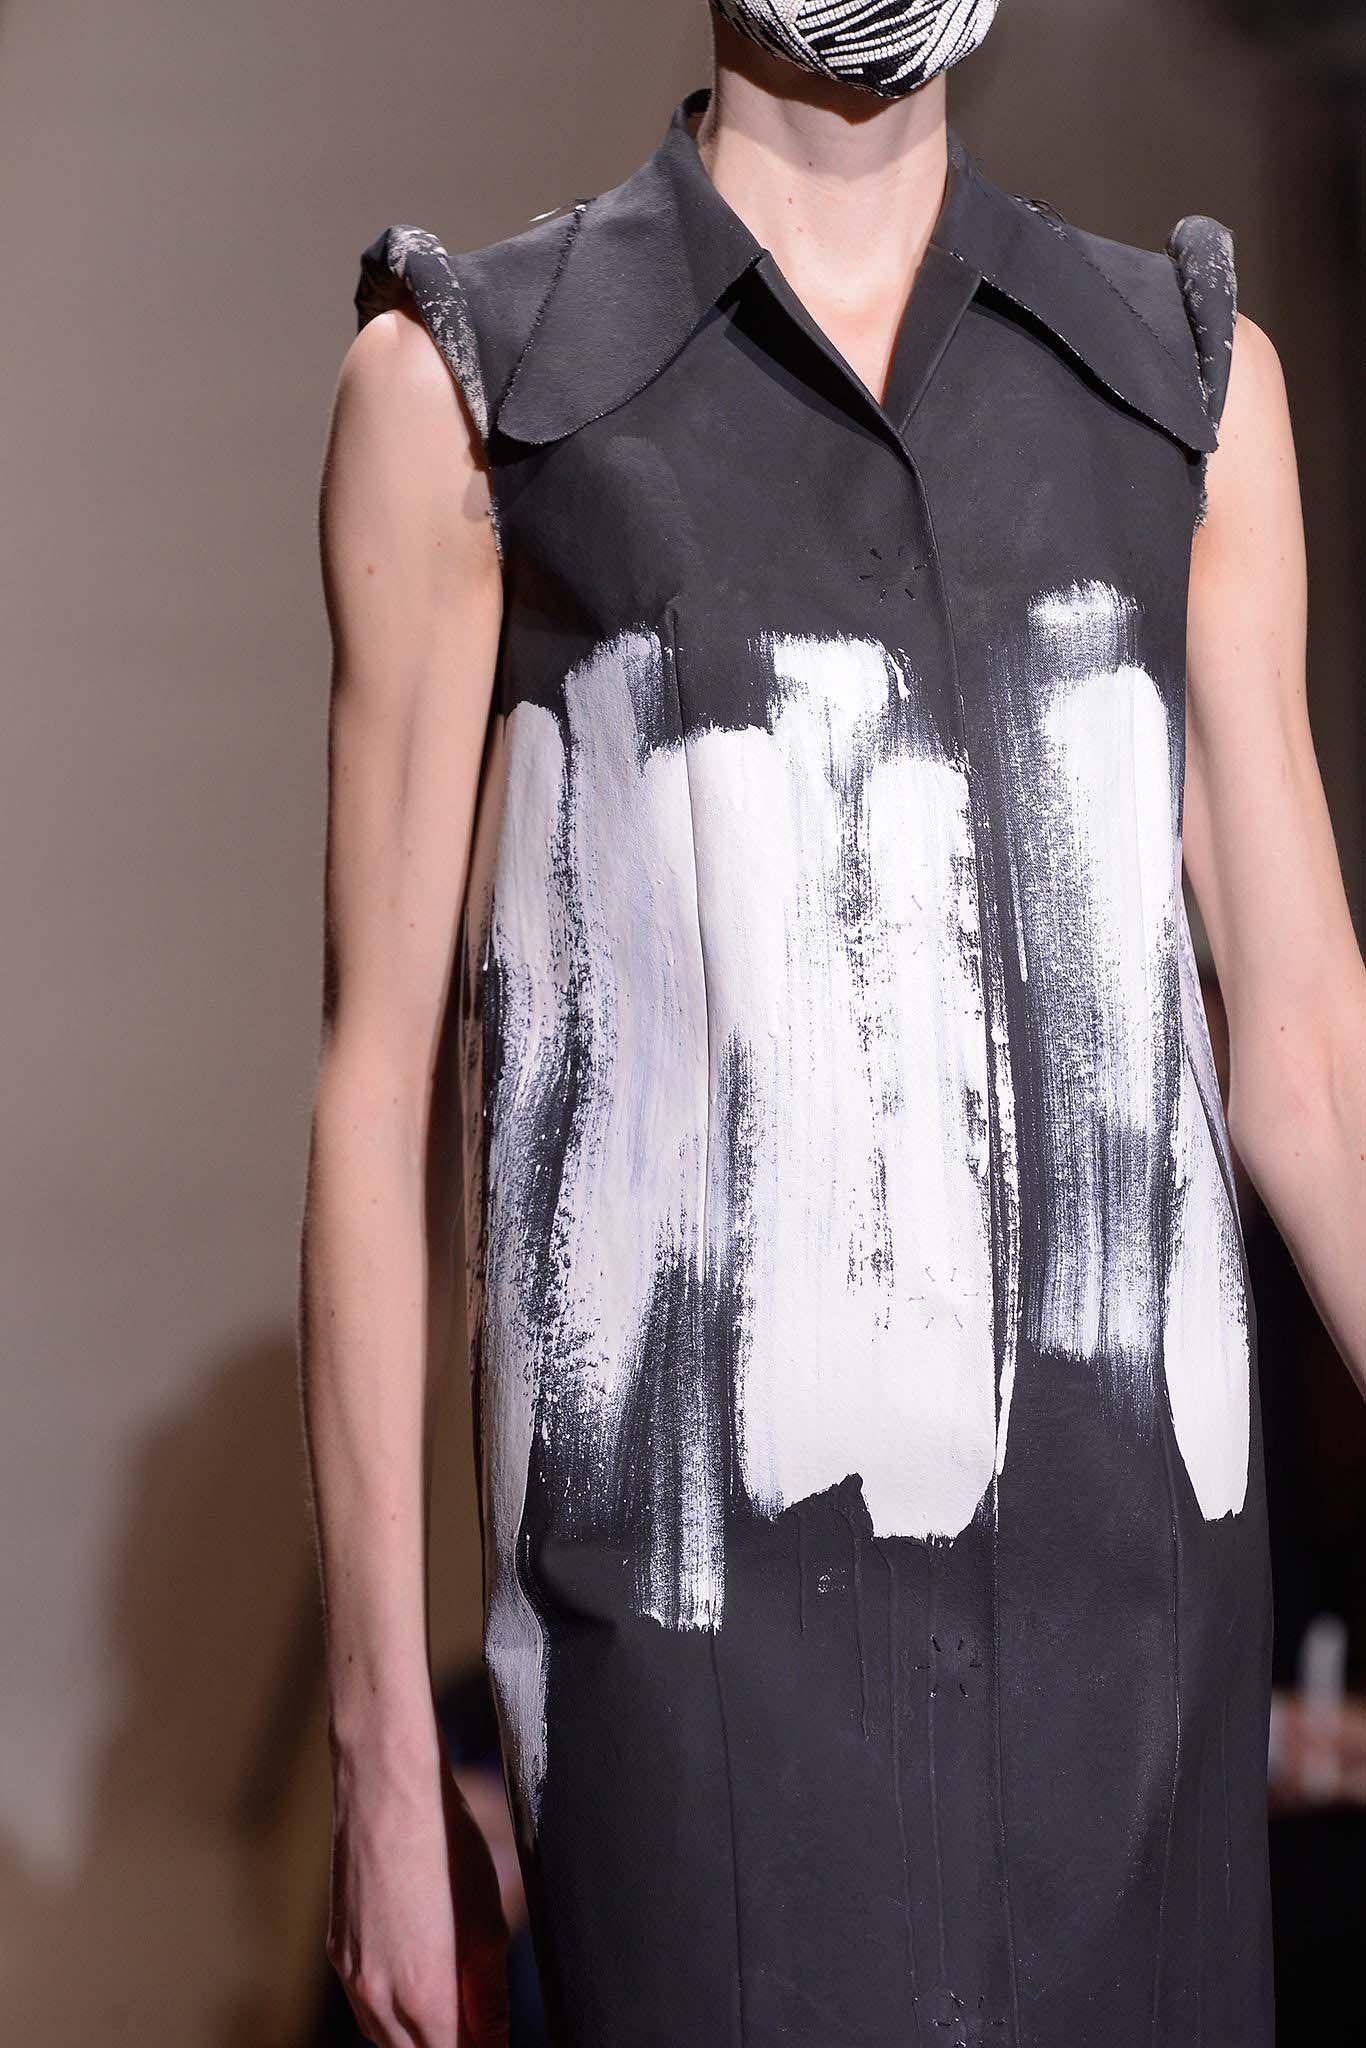 Maison Margiela Spring 2013 Couture